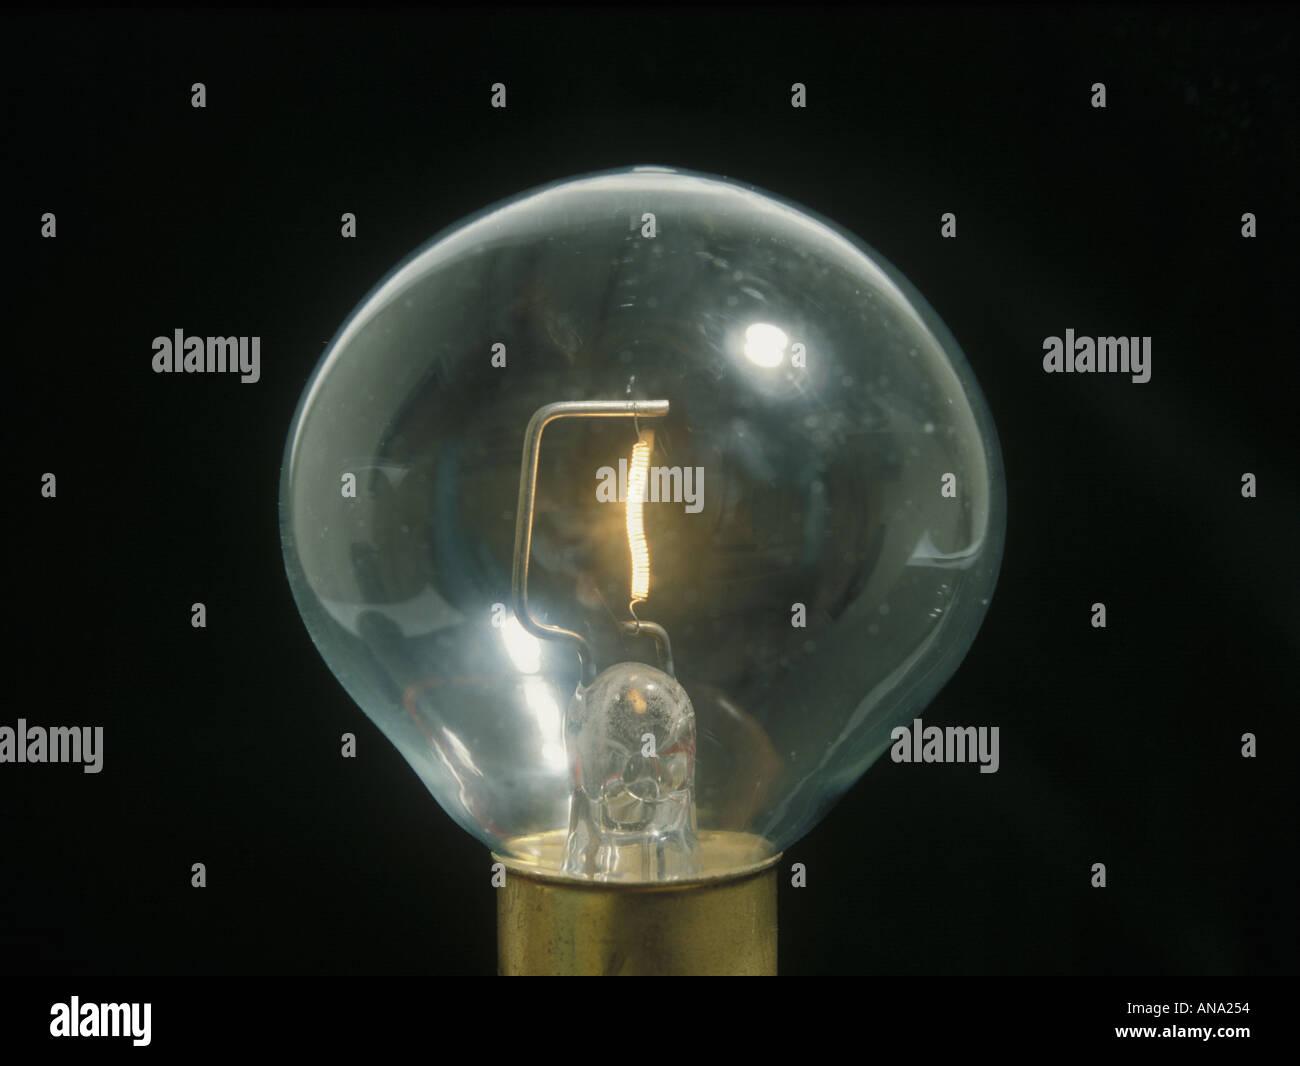 Lámpara de filamento de tungsteno de 12 voltios Imagen De Stock